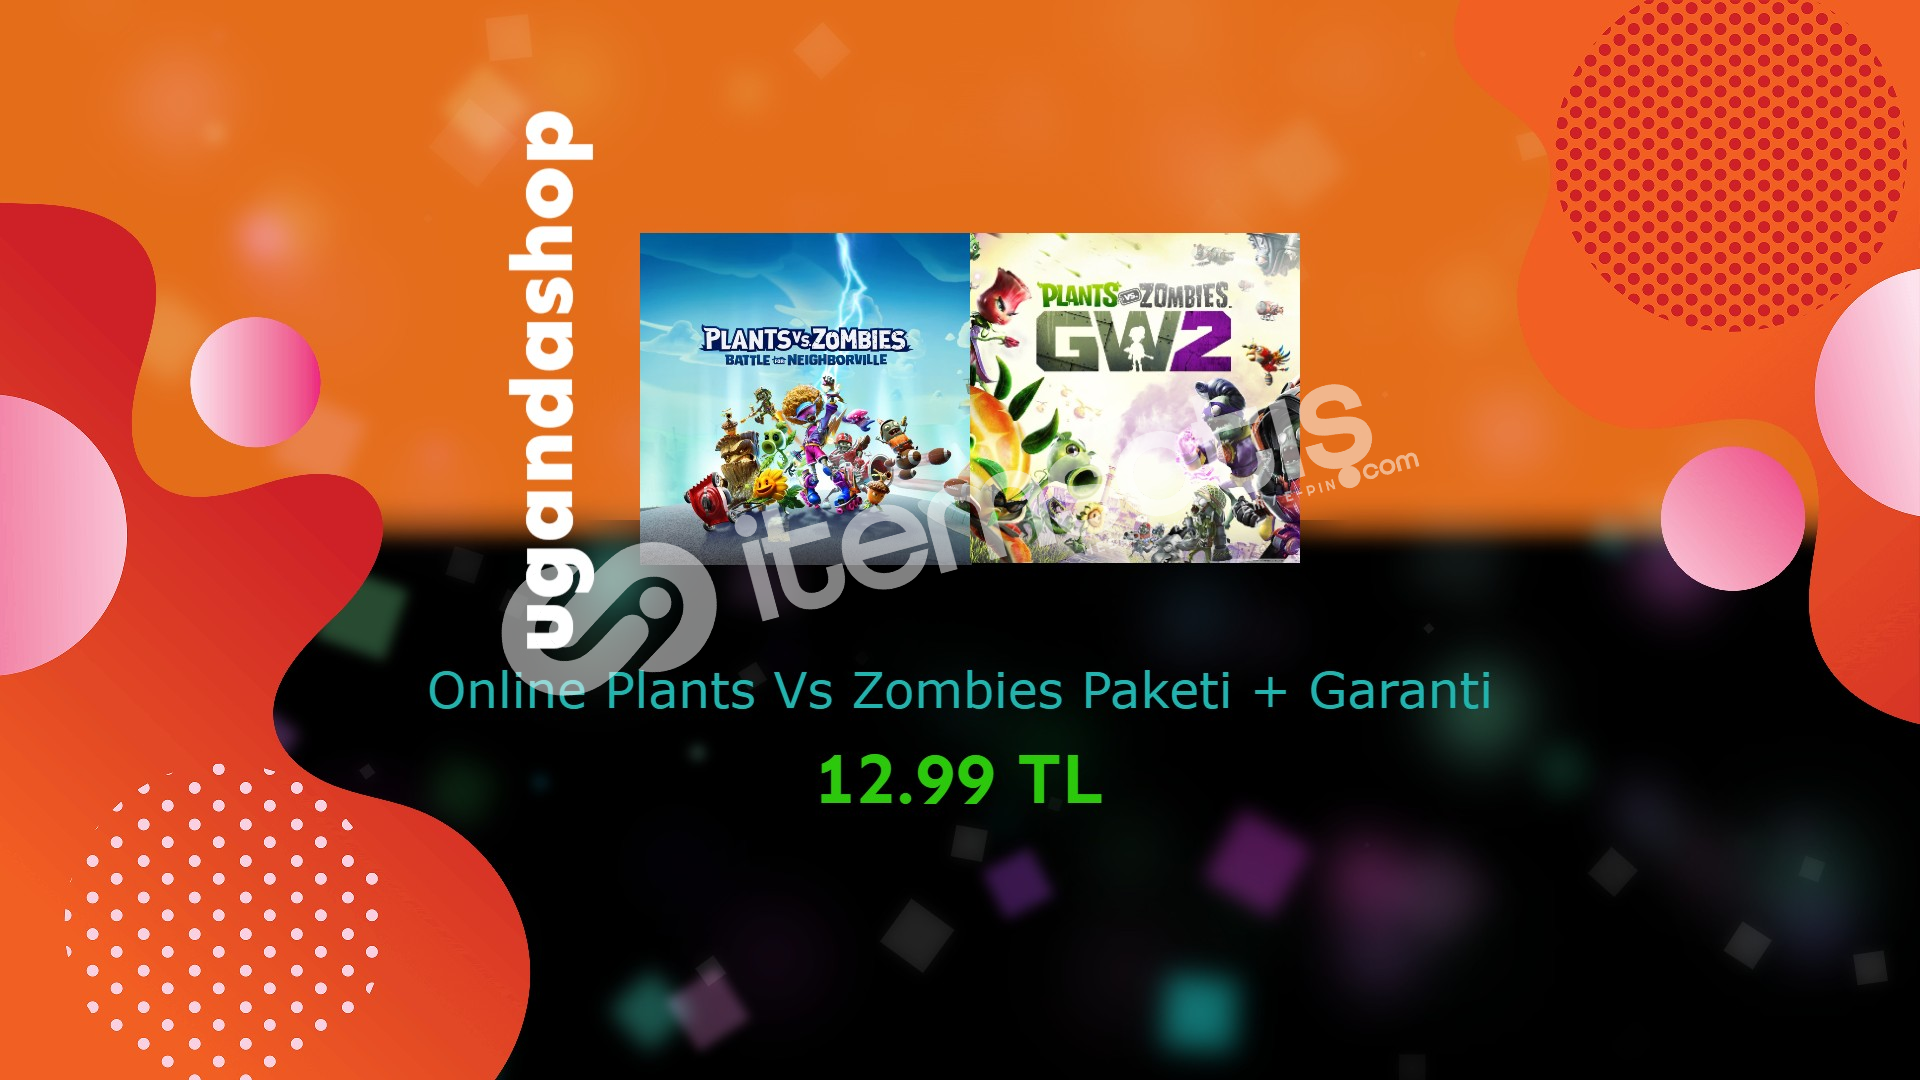 Plants vs Zombies Battle for Neighborville + Garden Warfare2